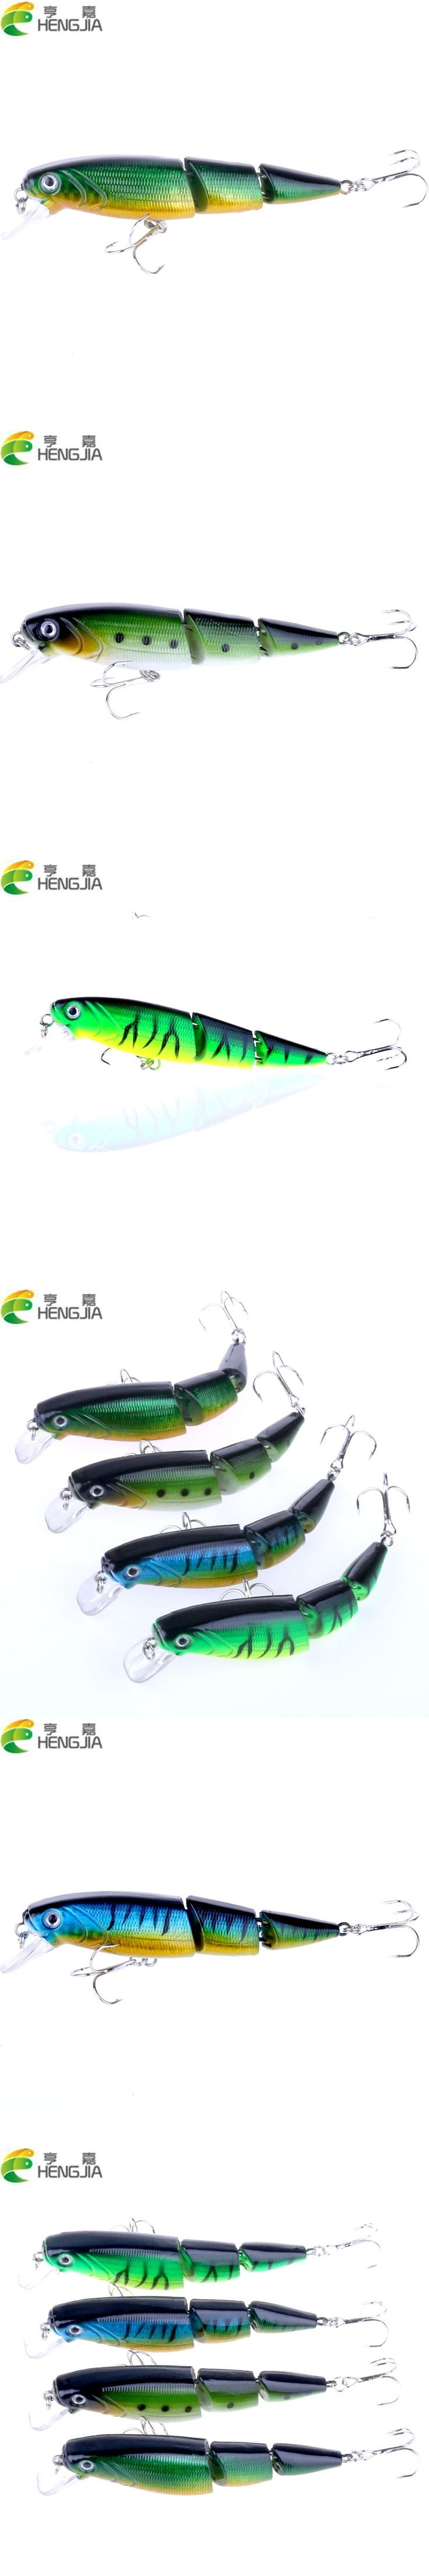 4pcs 10.5cm 14g 6#hooks  jointed minnow fishing lures bass wobbler pike carp trout catfish fishing baits pesca fishing tackle